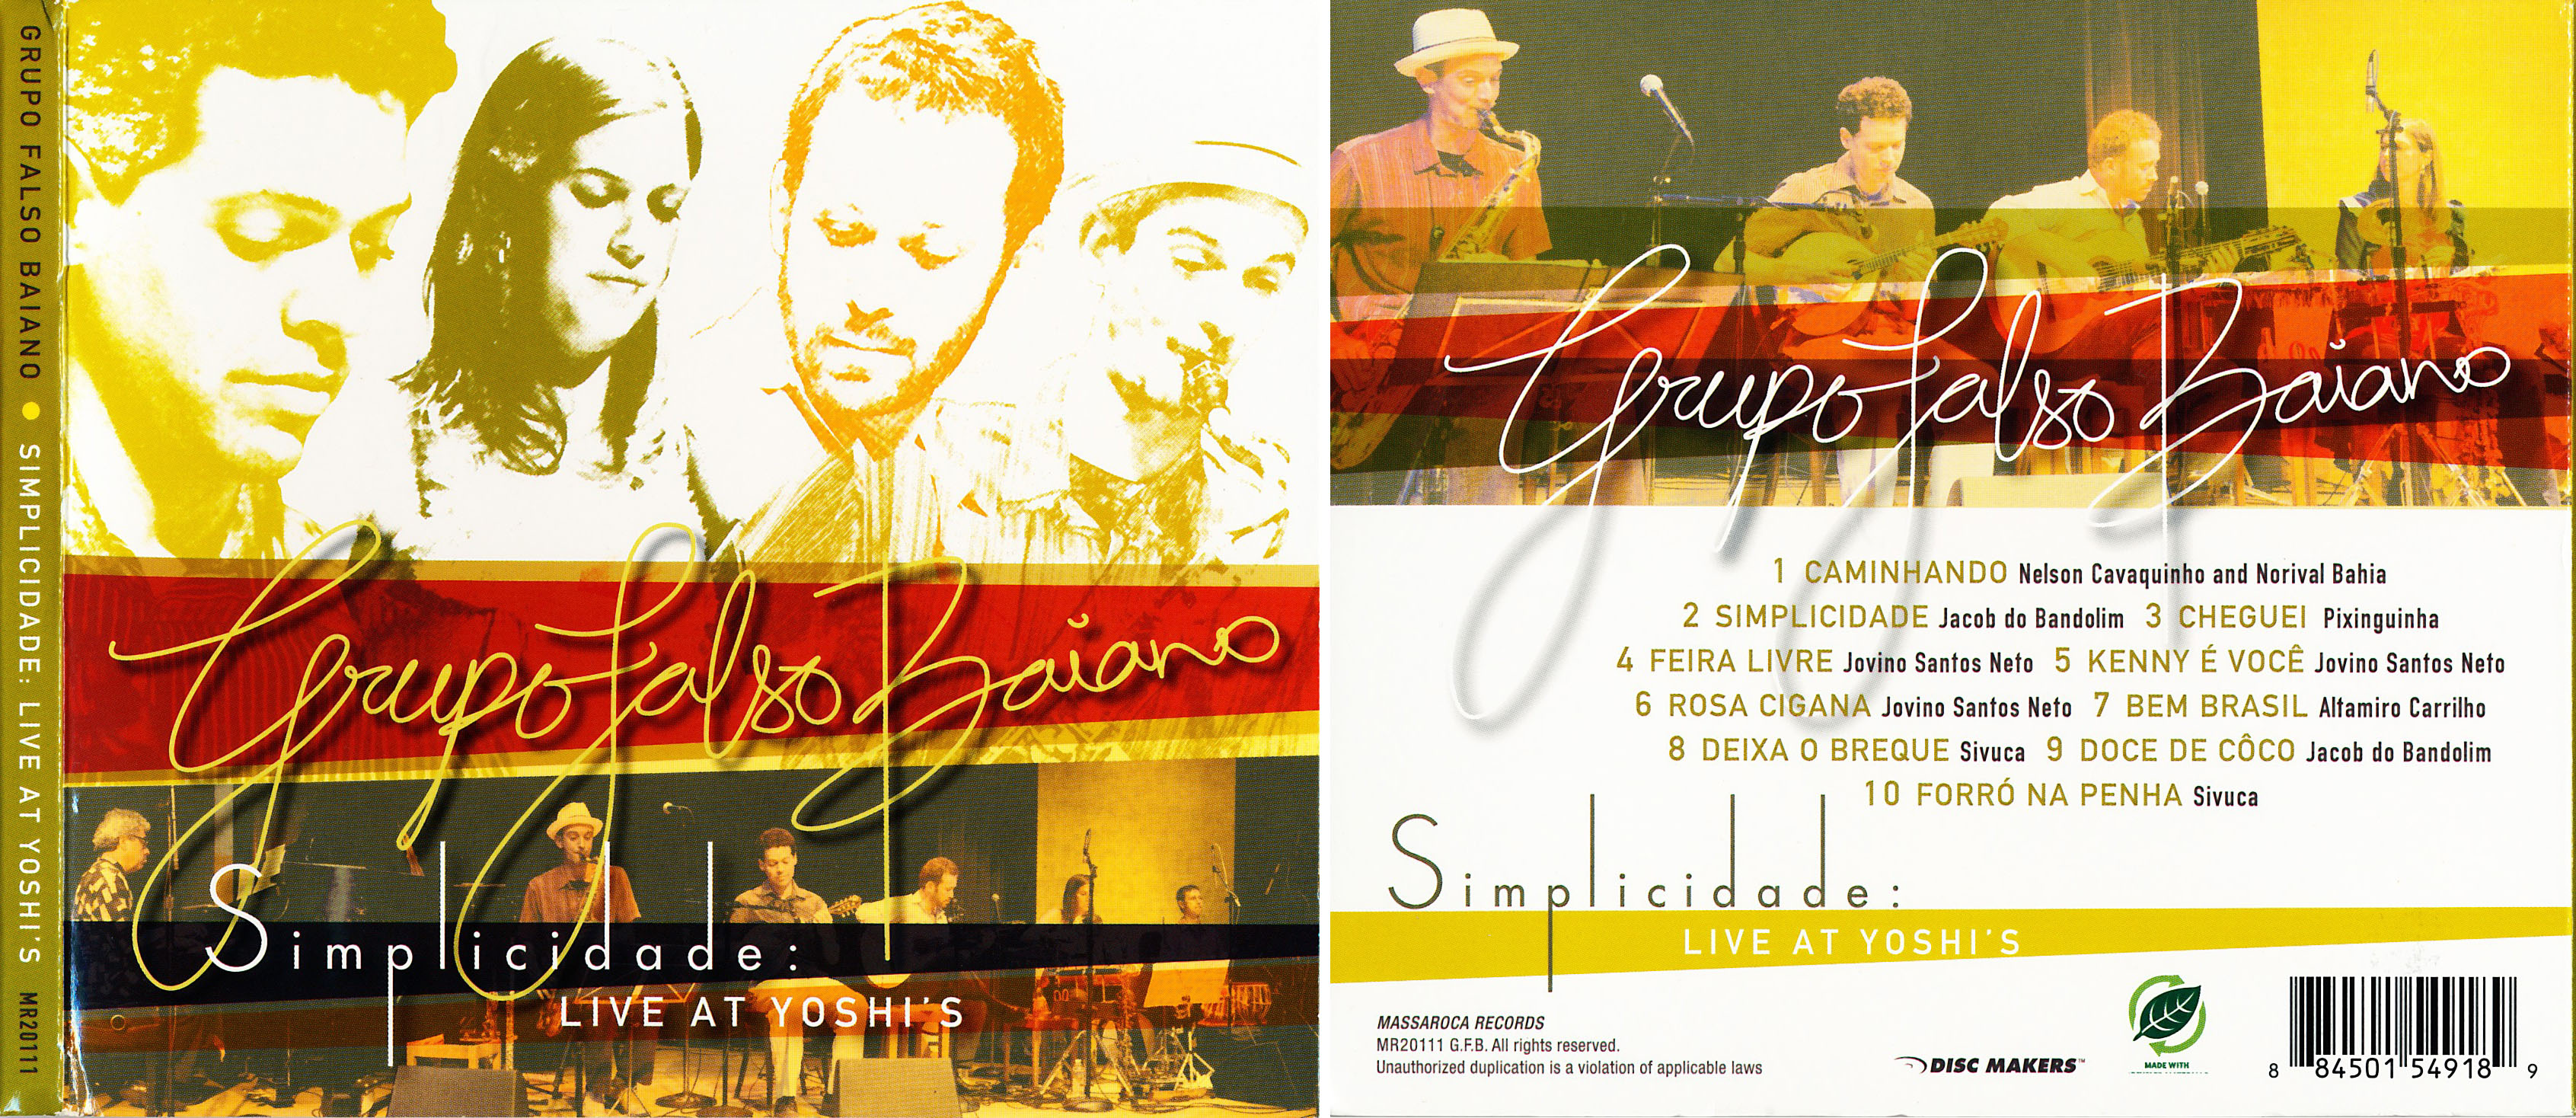 Grupo Falso Baiano | Simplicidade Live at Yoshi's